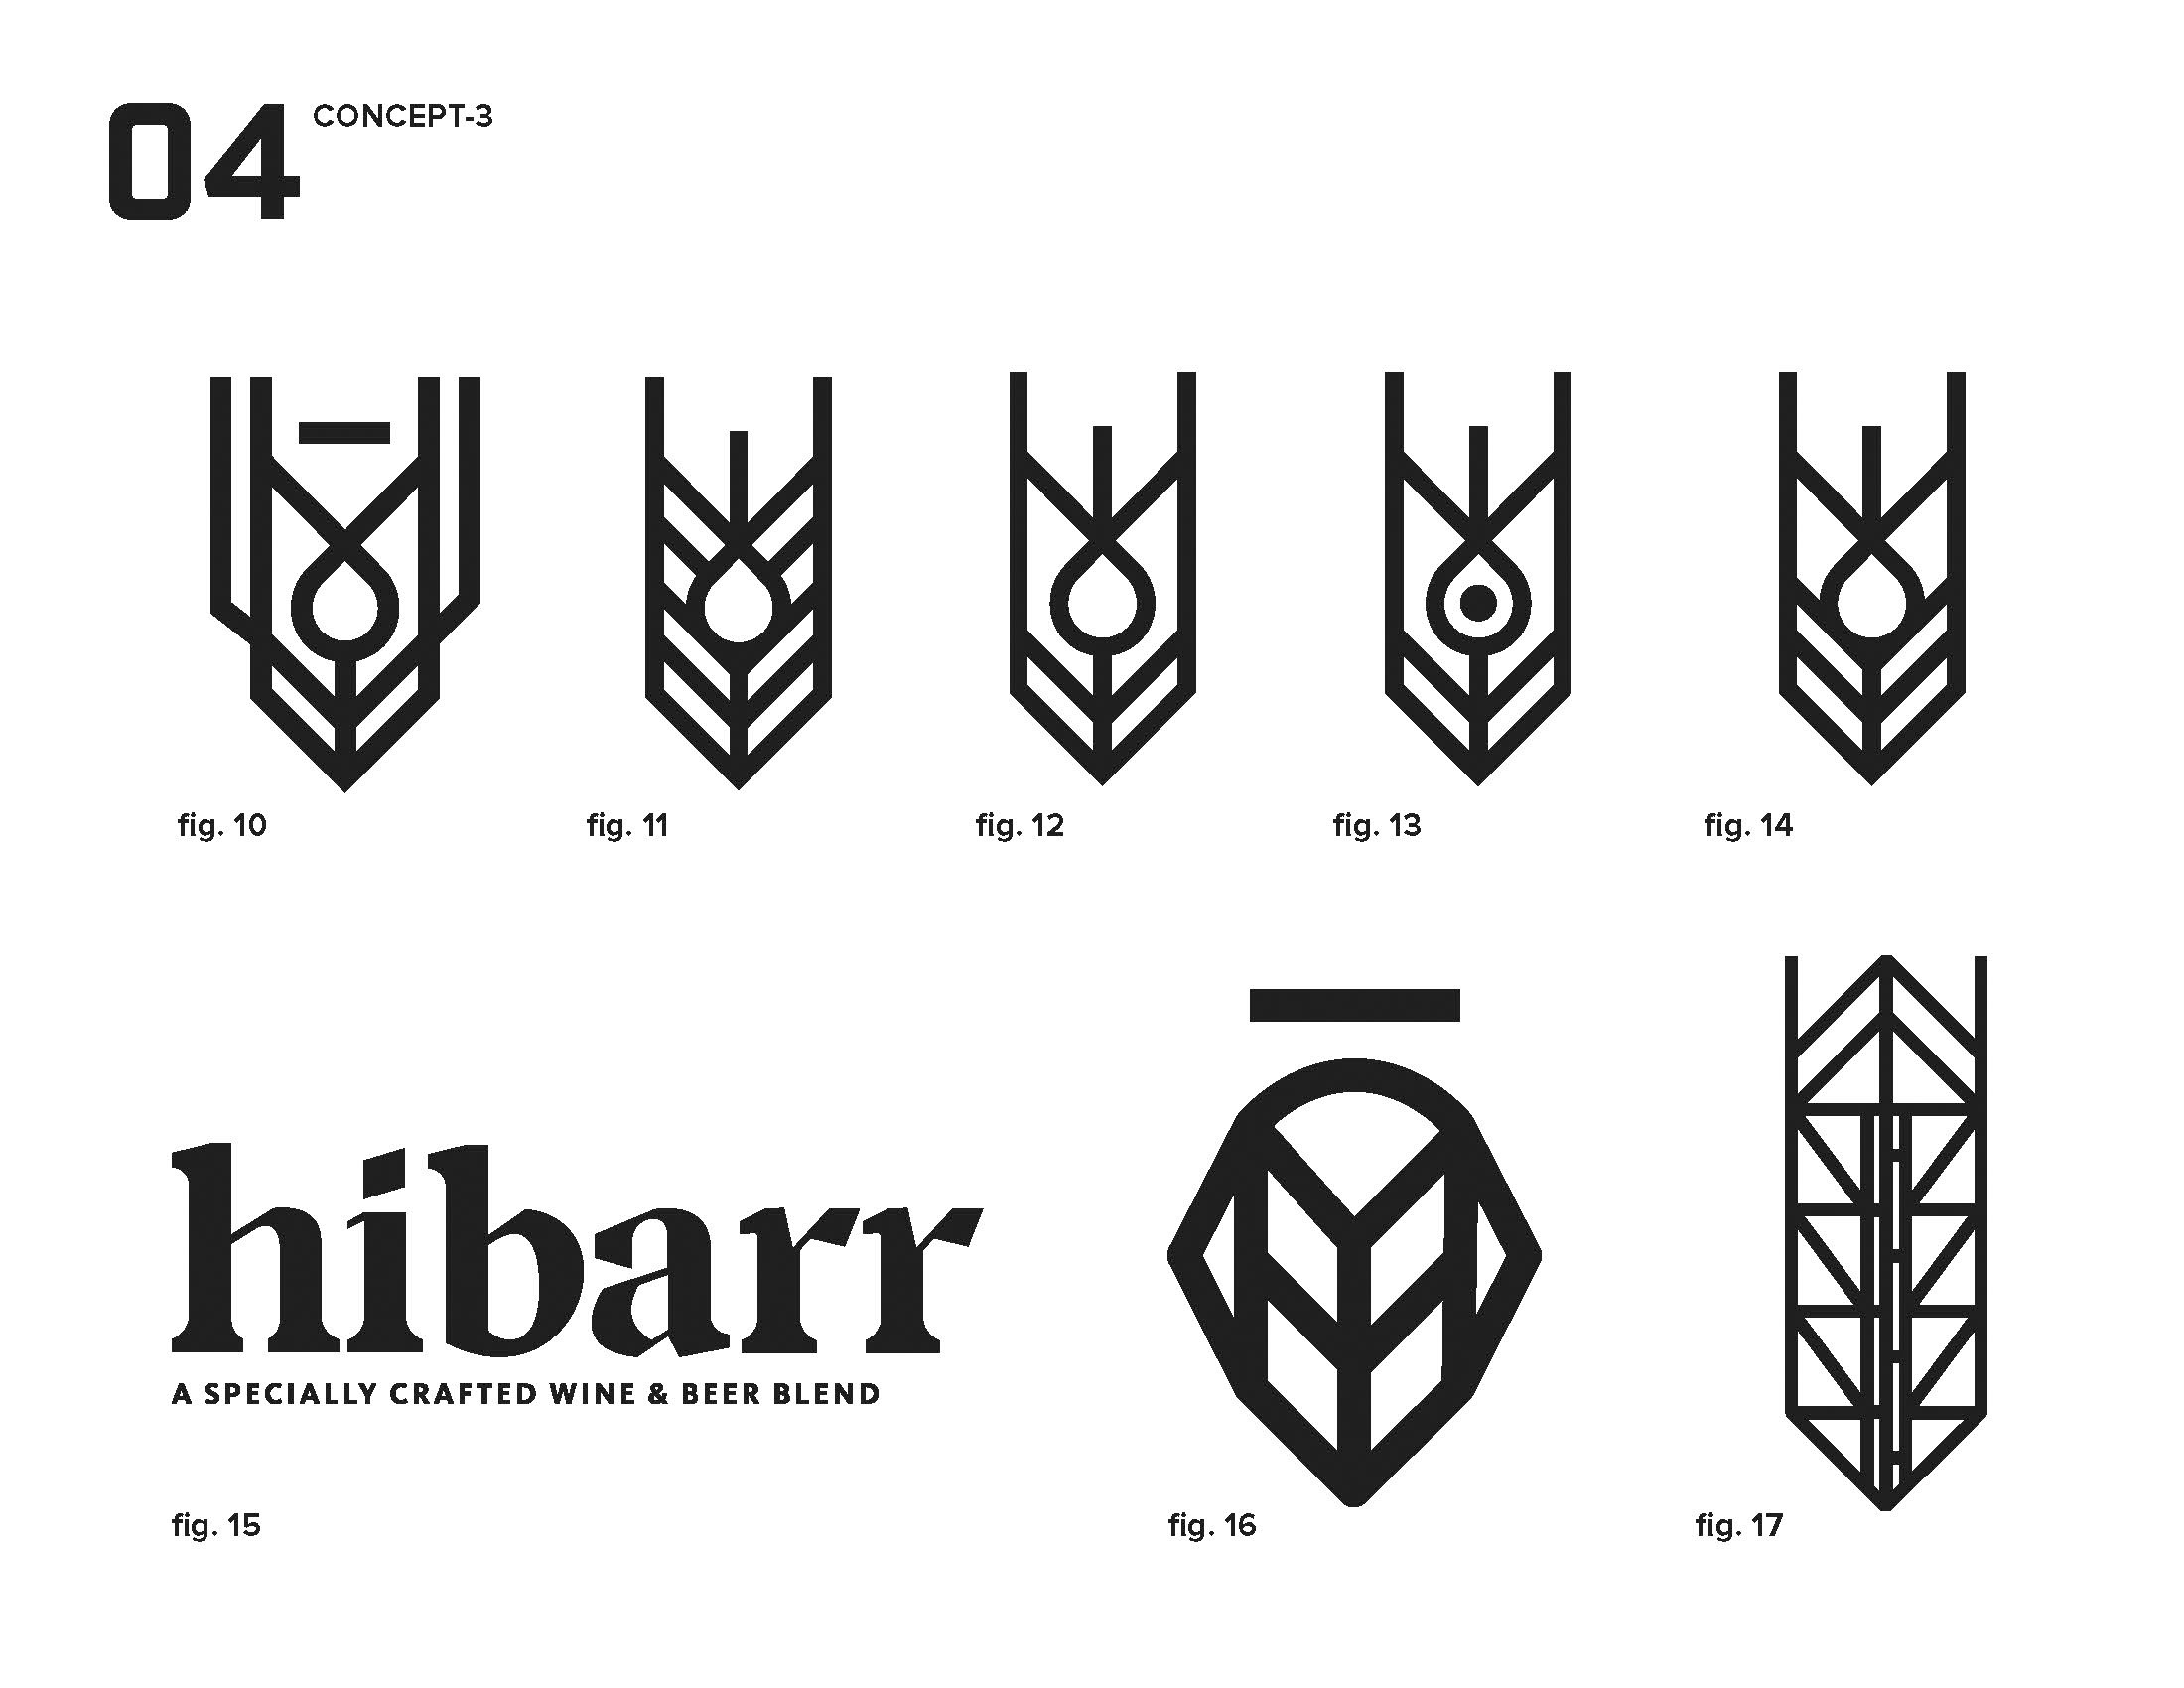 hibarr_presentation_Page_11.jpg